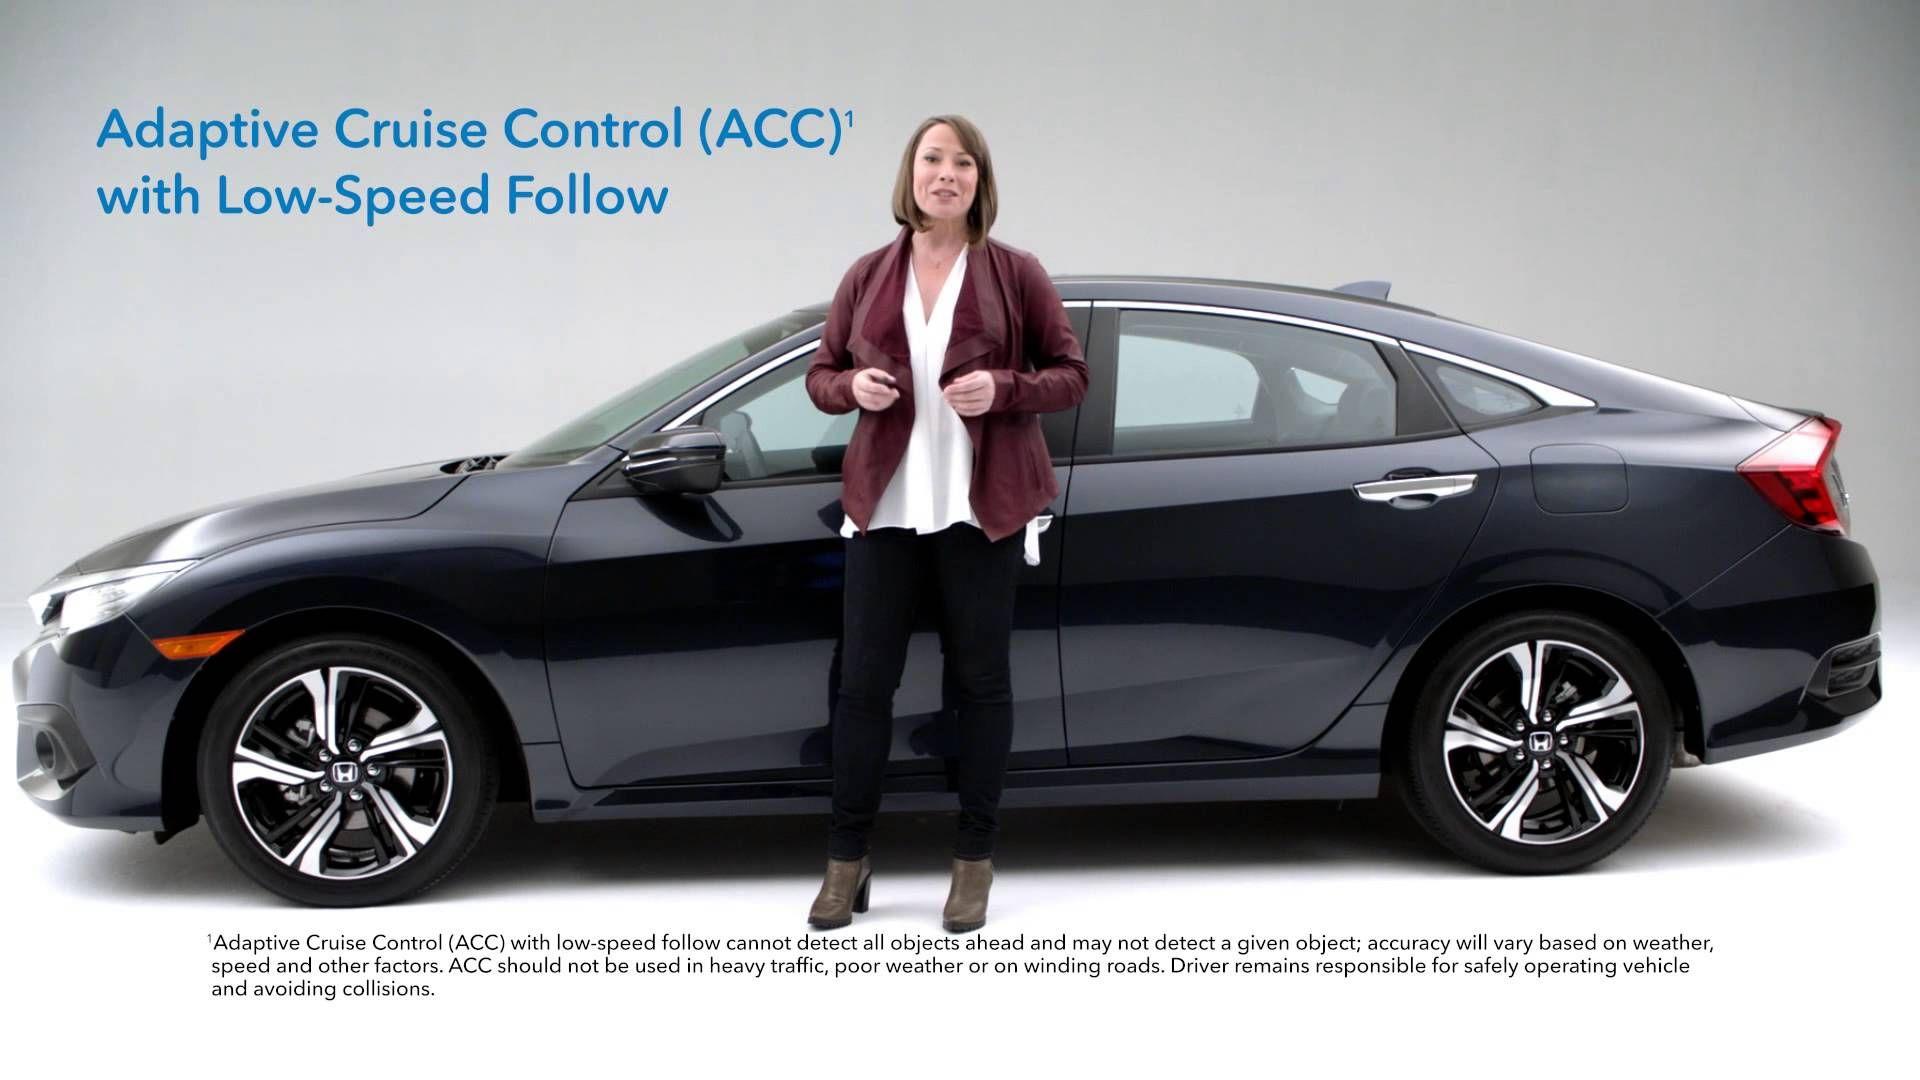 The AllNew 2016 Civic Sedan Offers CategoryLeading